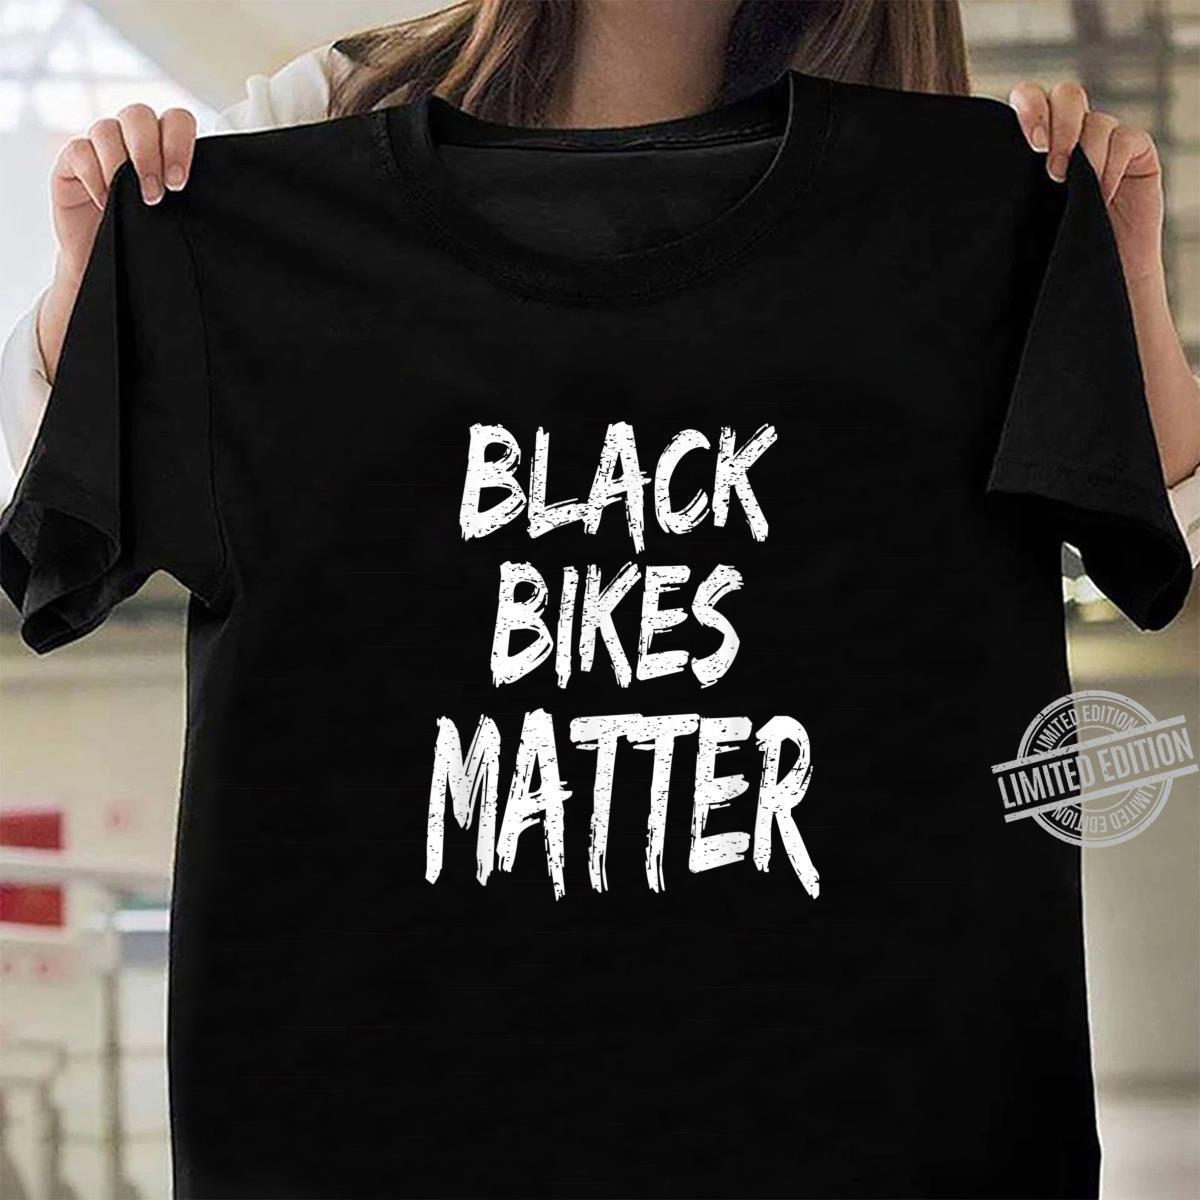 Funny Black Bikes Matter Motorcycle Biker Shirt ladies tee